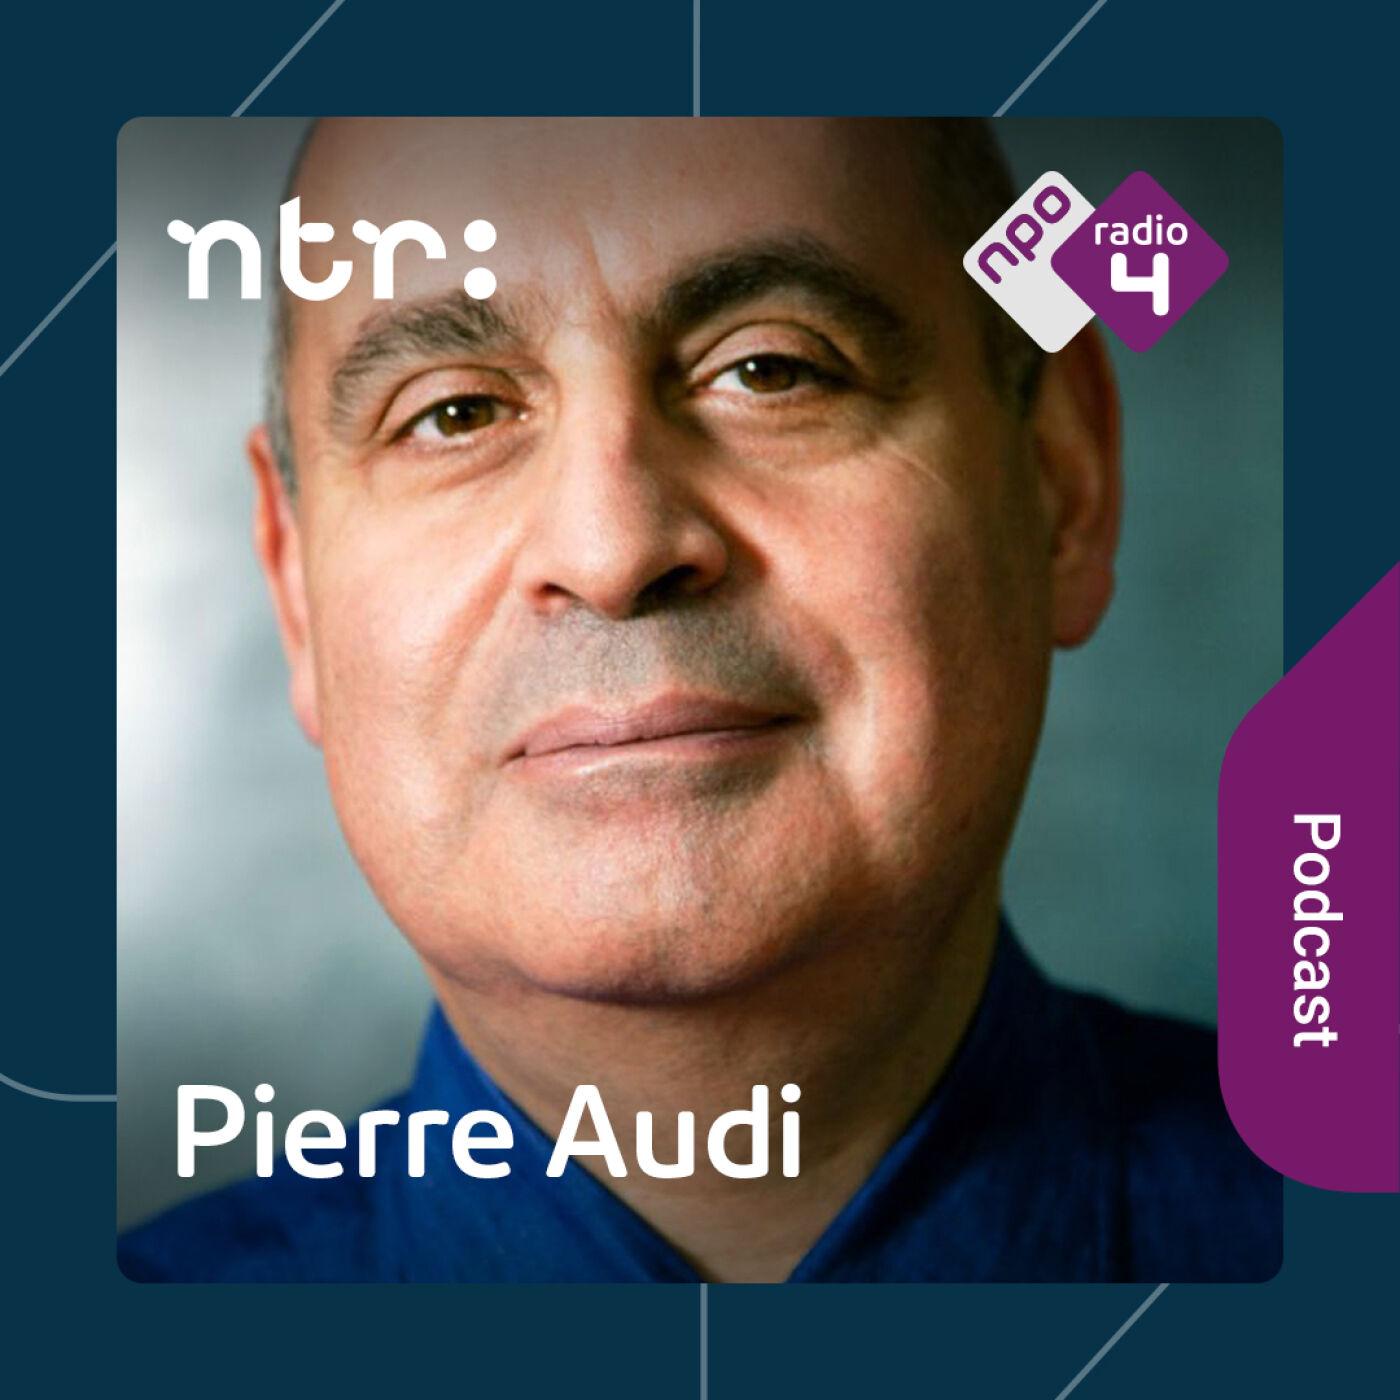 Pierre Audi logo